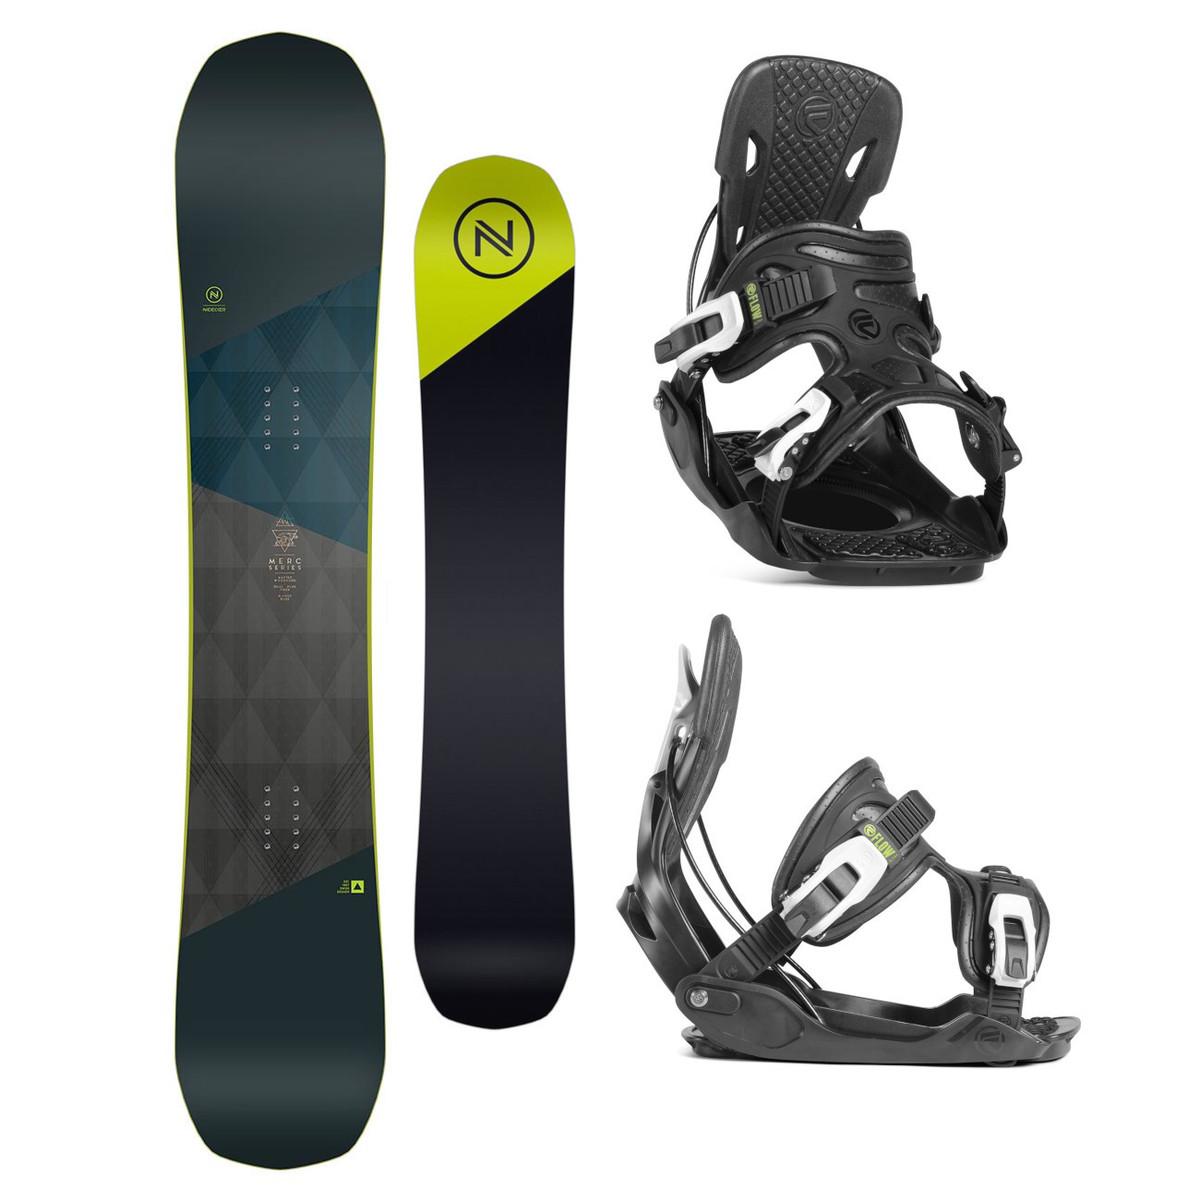 Snowboardový set Nidecker Merc 18/19 XL (EU 44-49,5) 162W